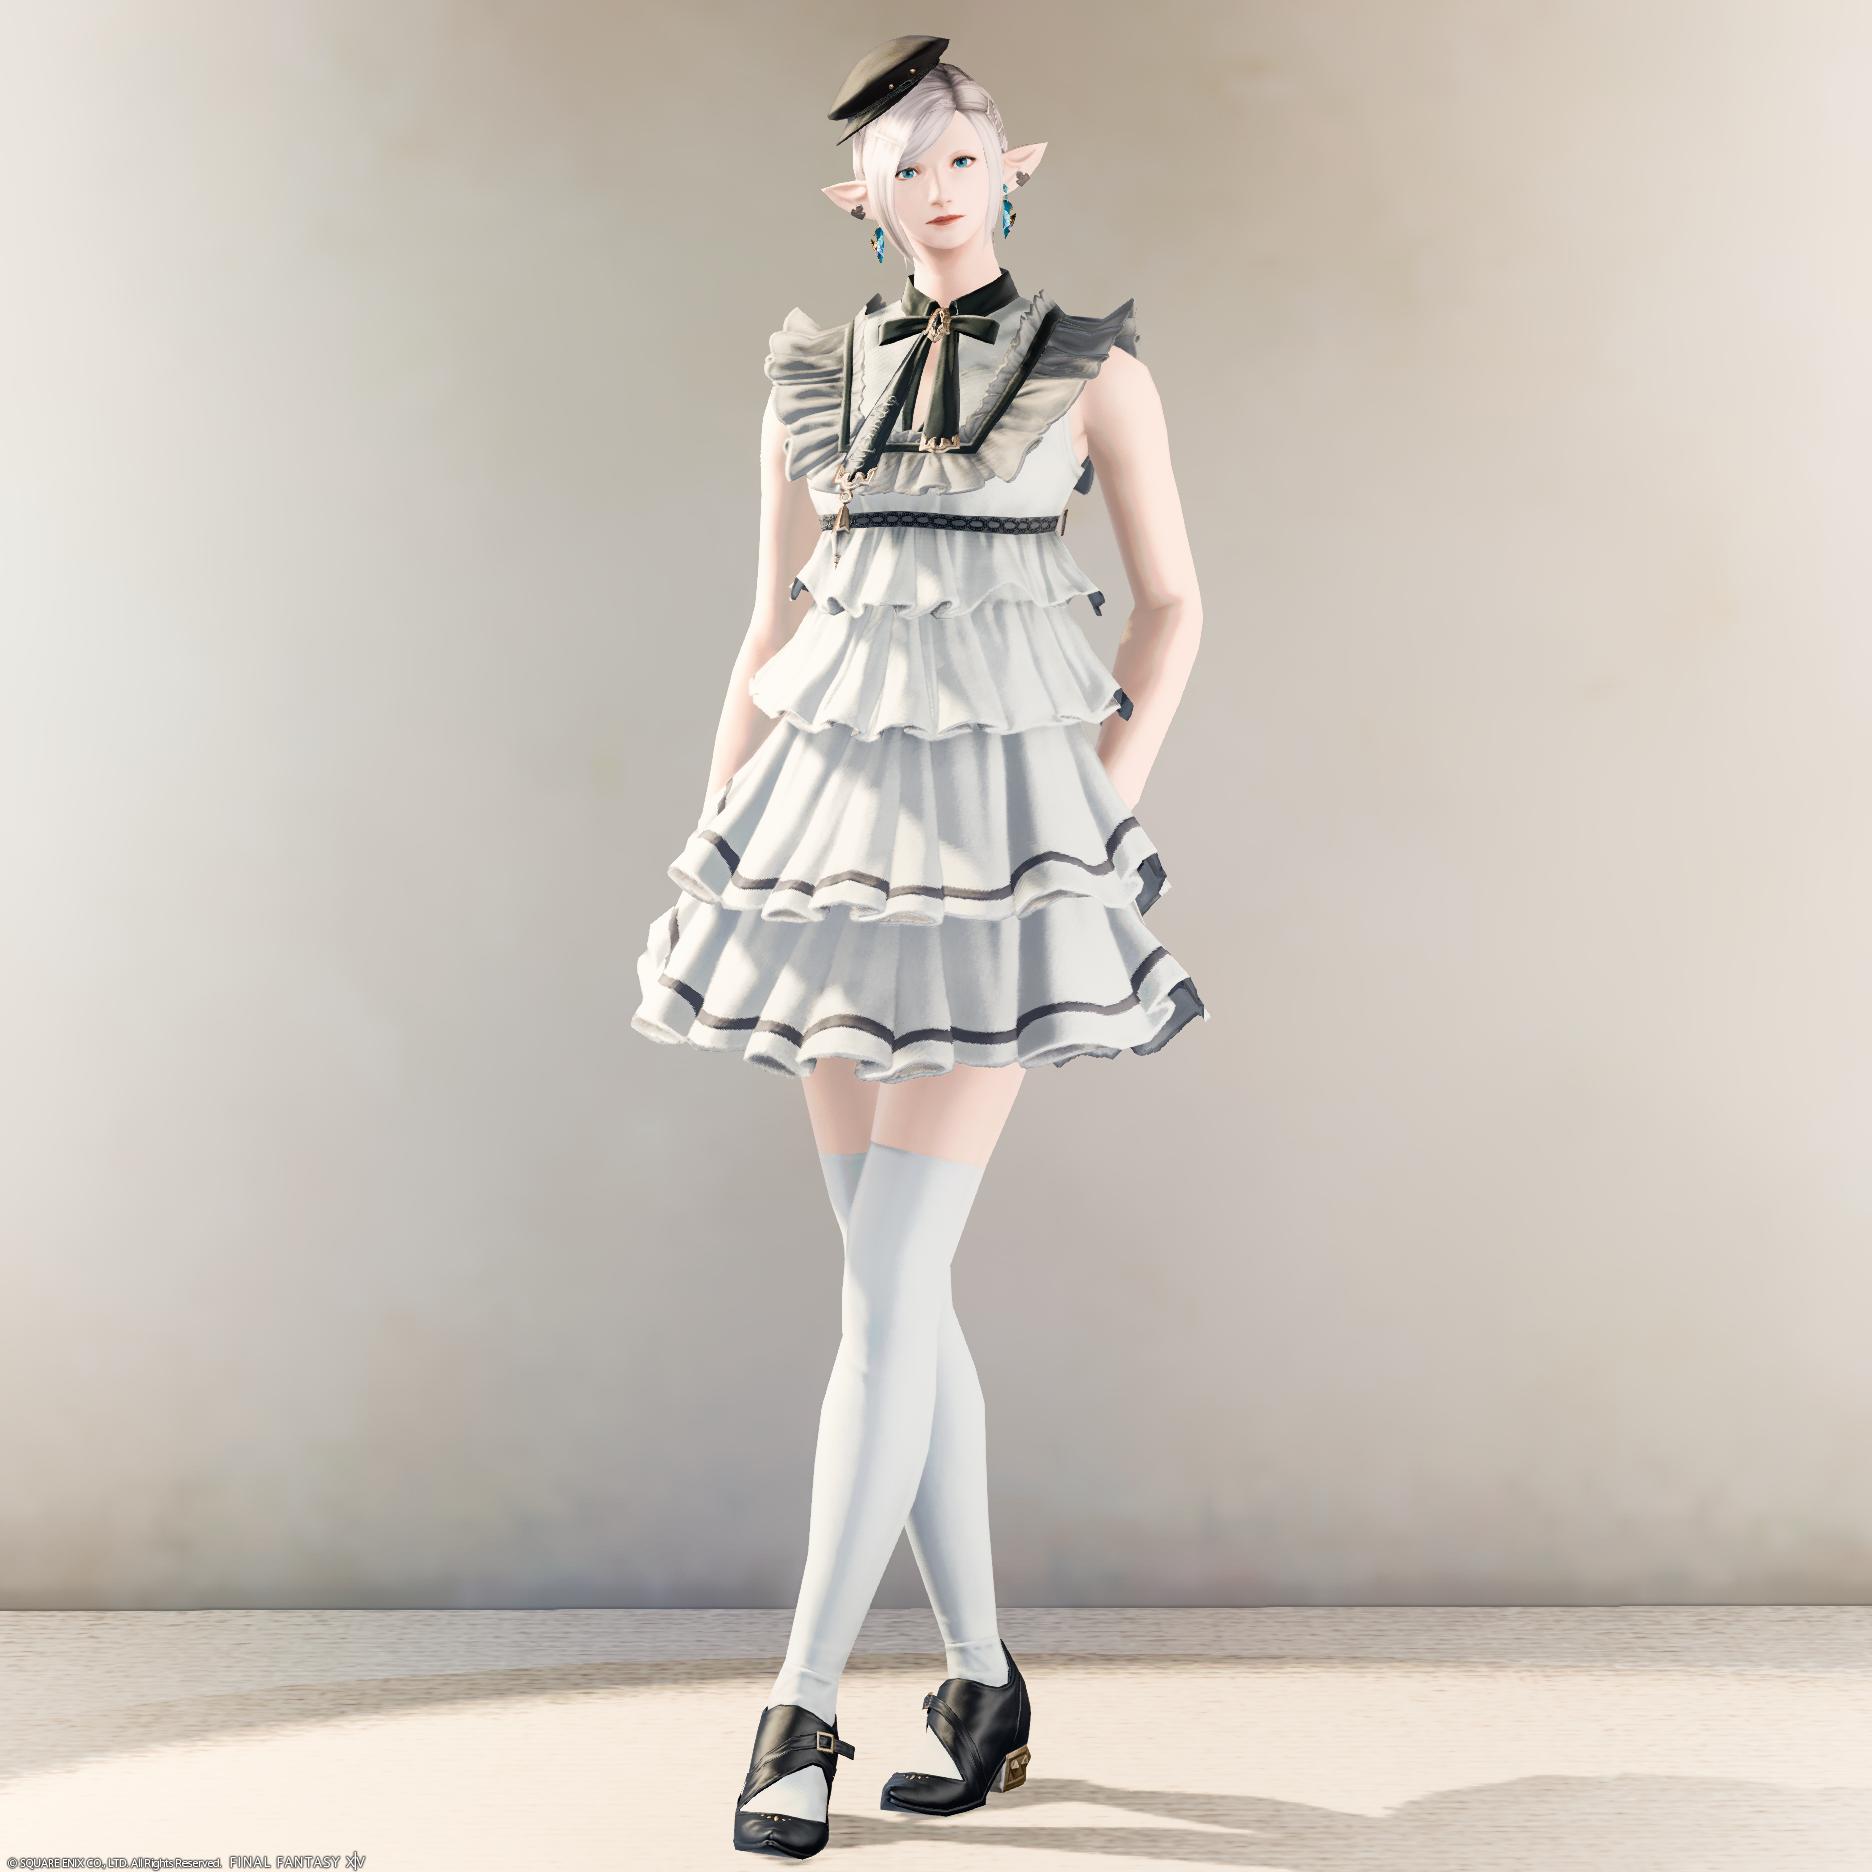 Eorzea Database Quaintrelle 39 S Ruffled Dress Final Fantasy Xiv The Lodestone [ 1872 x 1872 Pixel ]